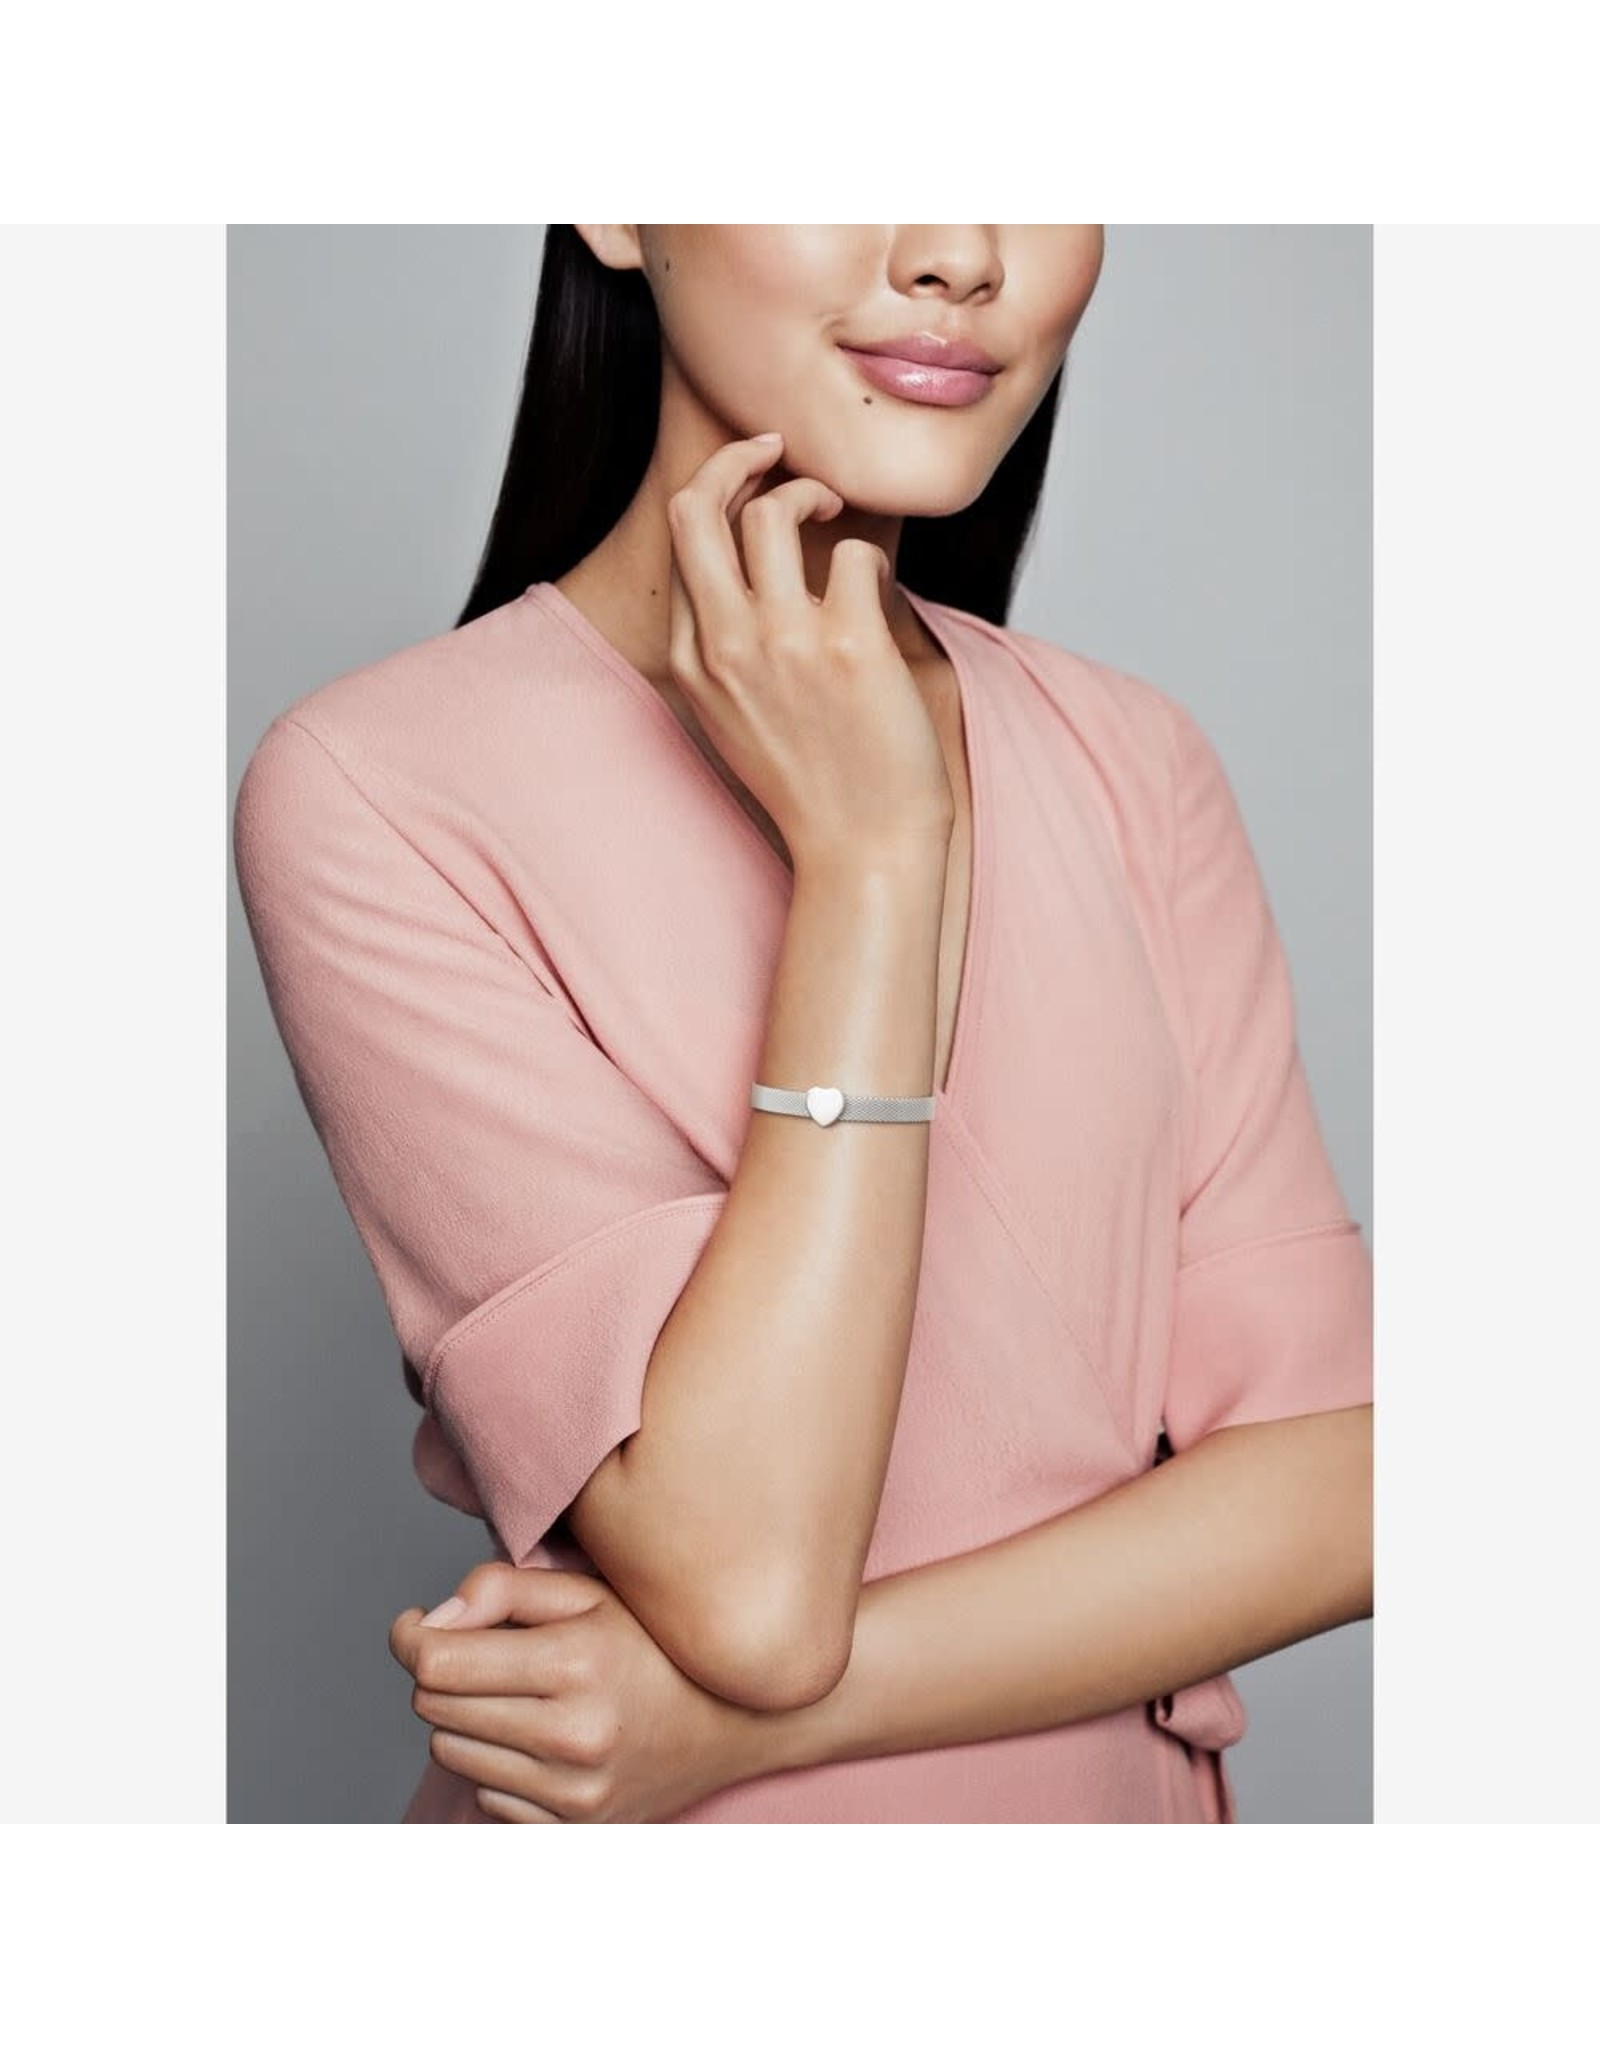 Pandora Pandora Reflexions Heart Clip Charm In Sterling Silver